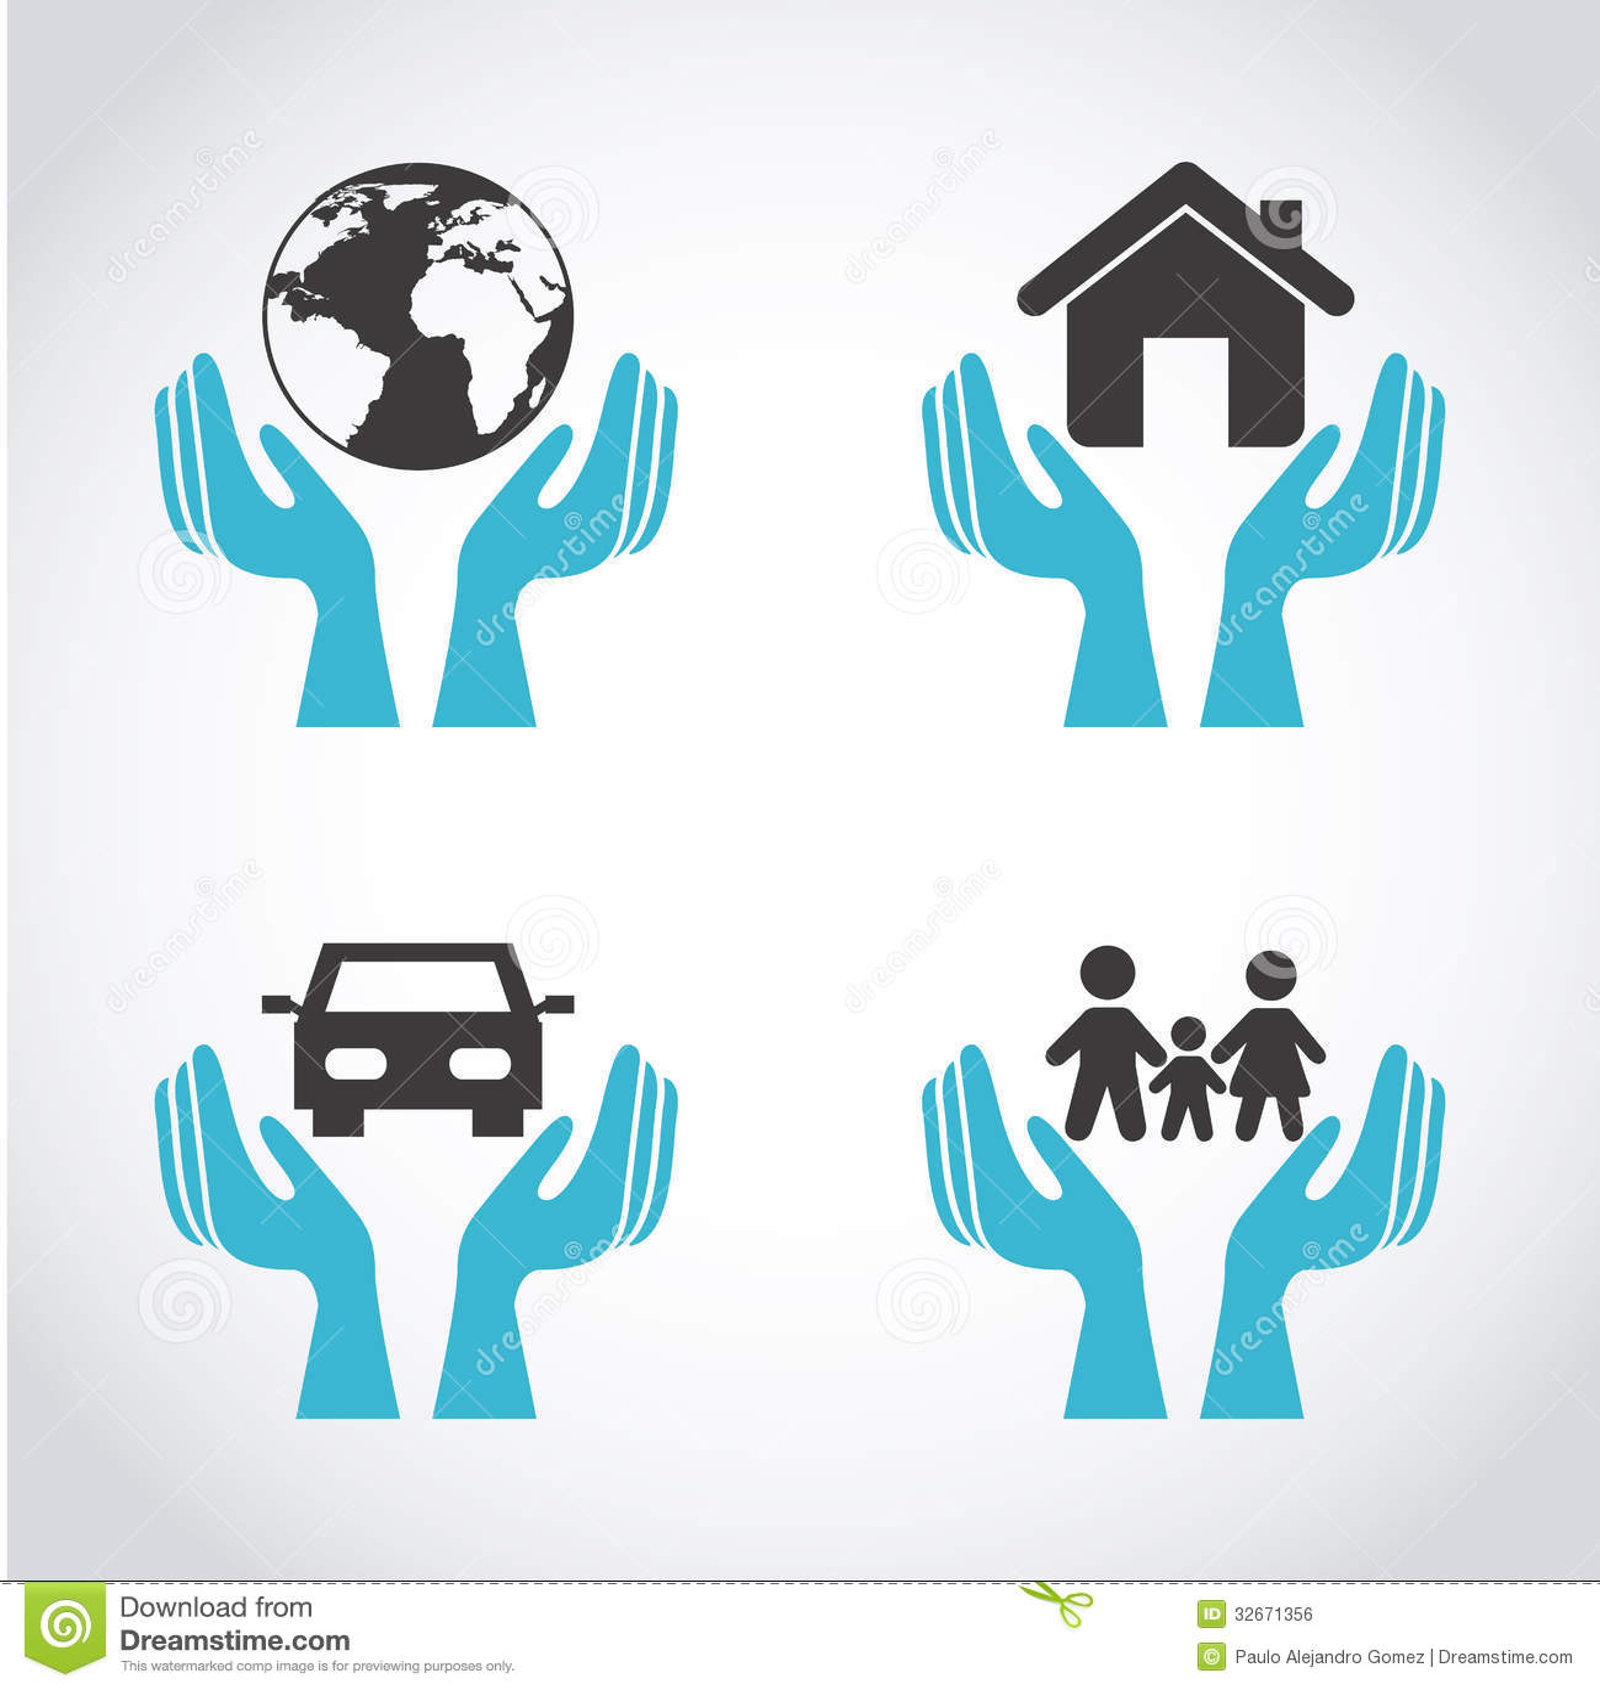 Insurance Icons Royalty Free Stock Image - Image: 32671356